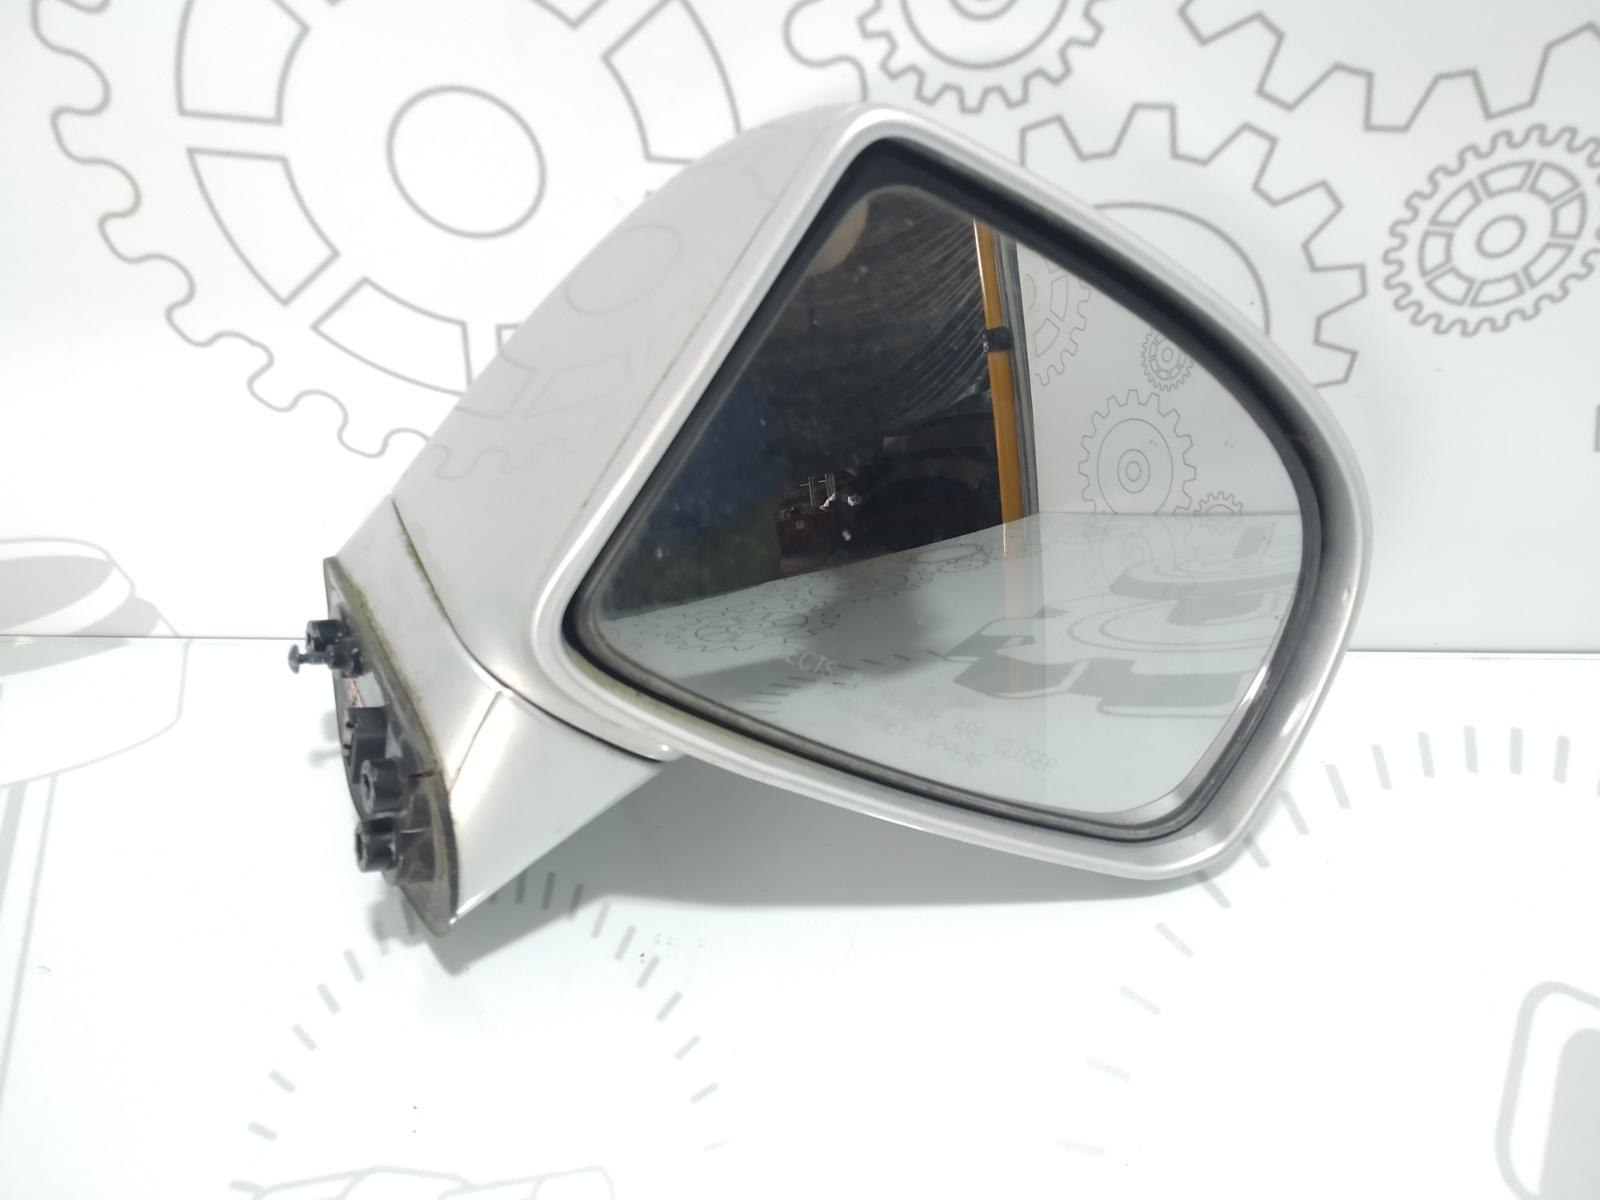 Зеркало наружное правое Kia Carens 2.0 CRDI 2006 (б/у)